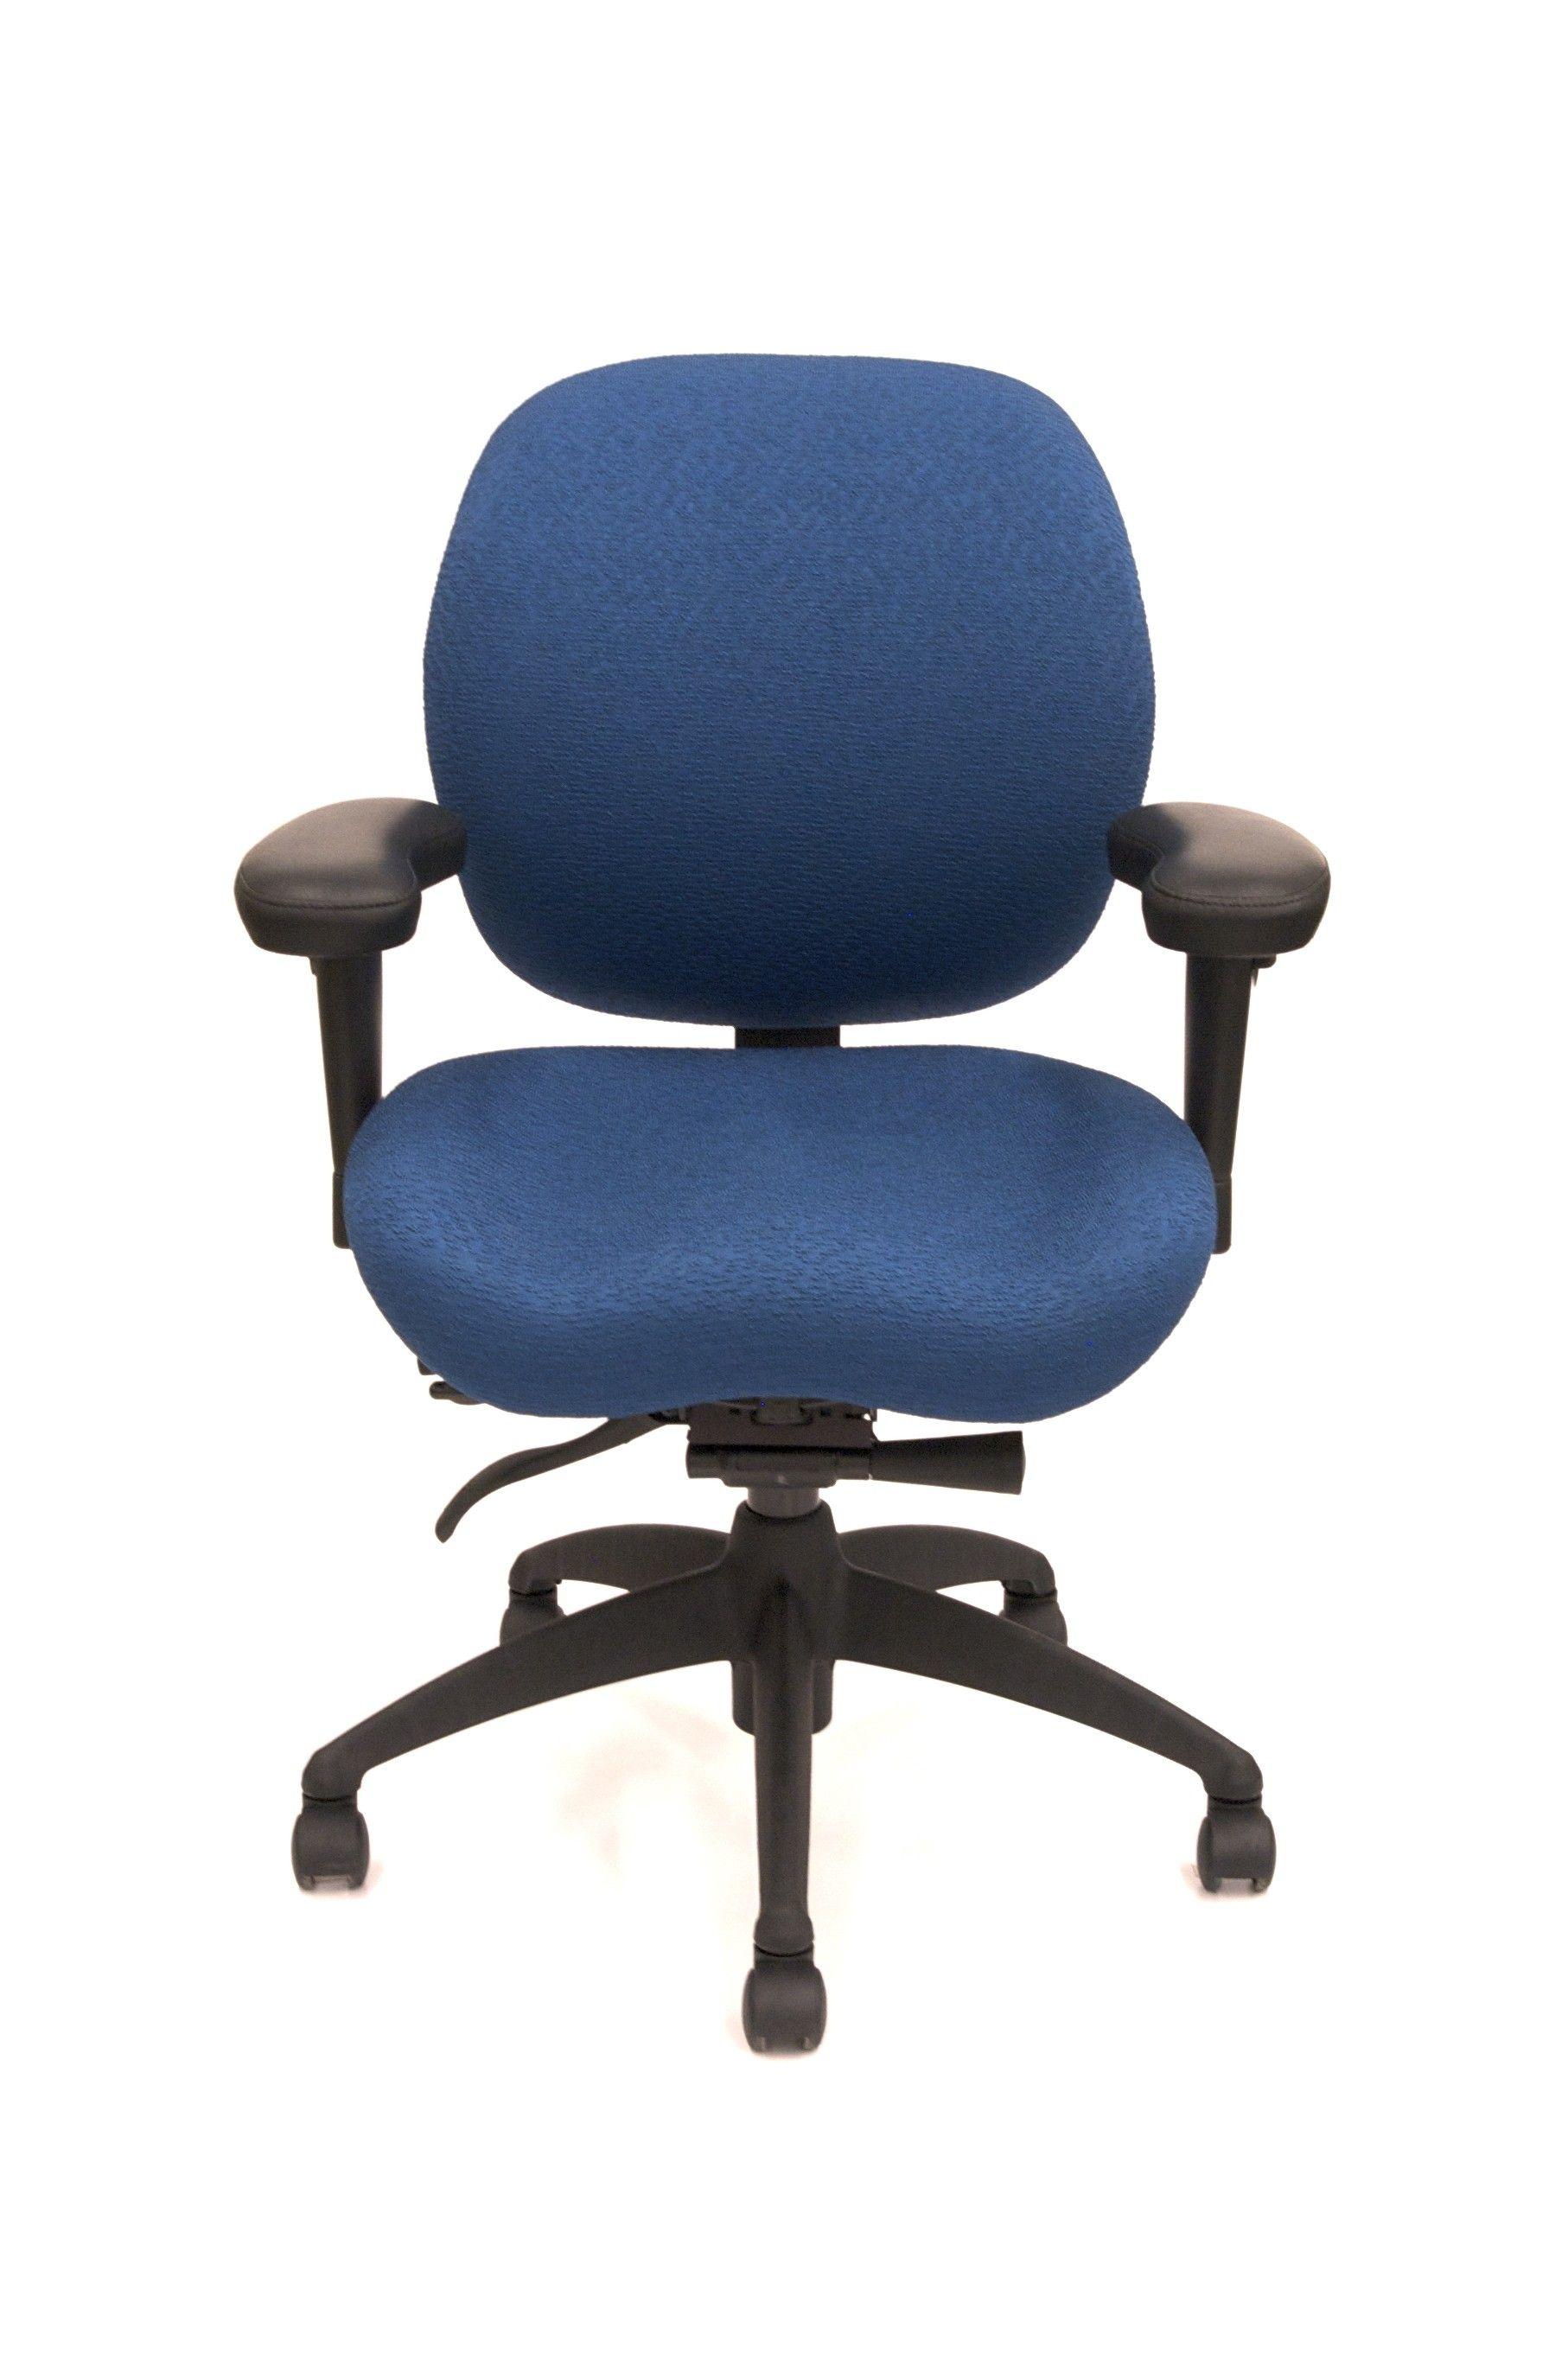 management grand chair pinterest daily activities memory foam